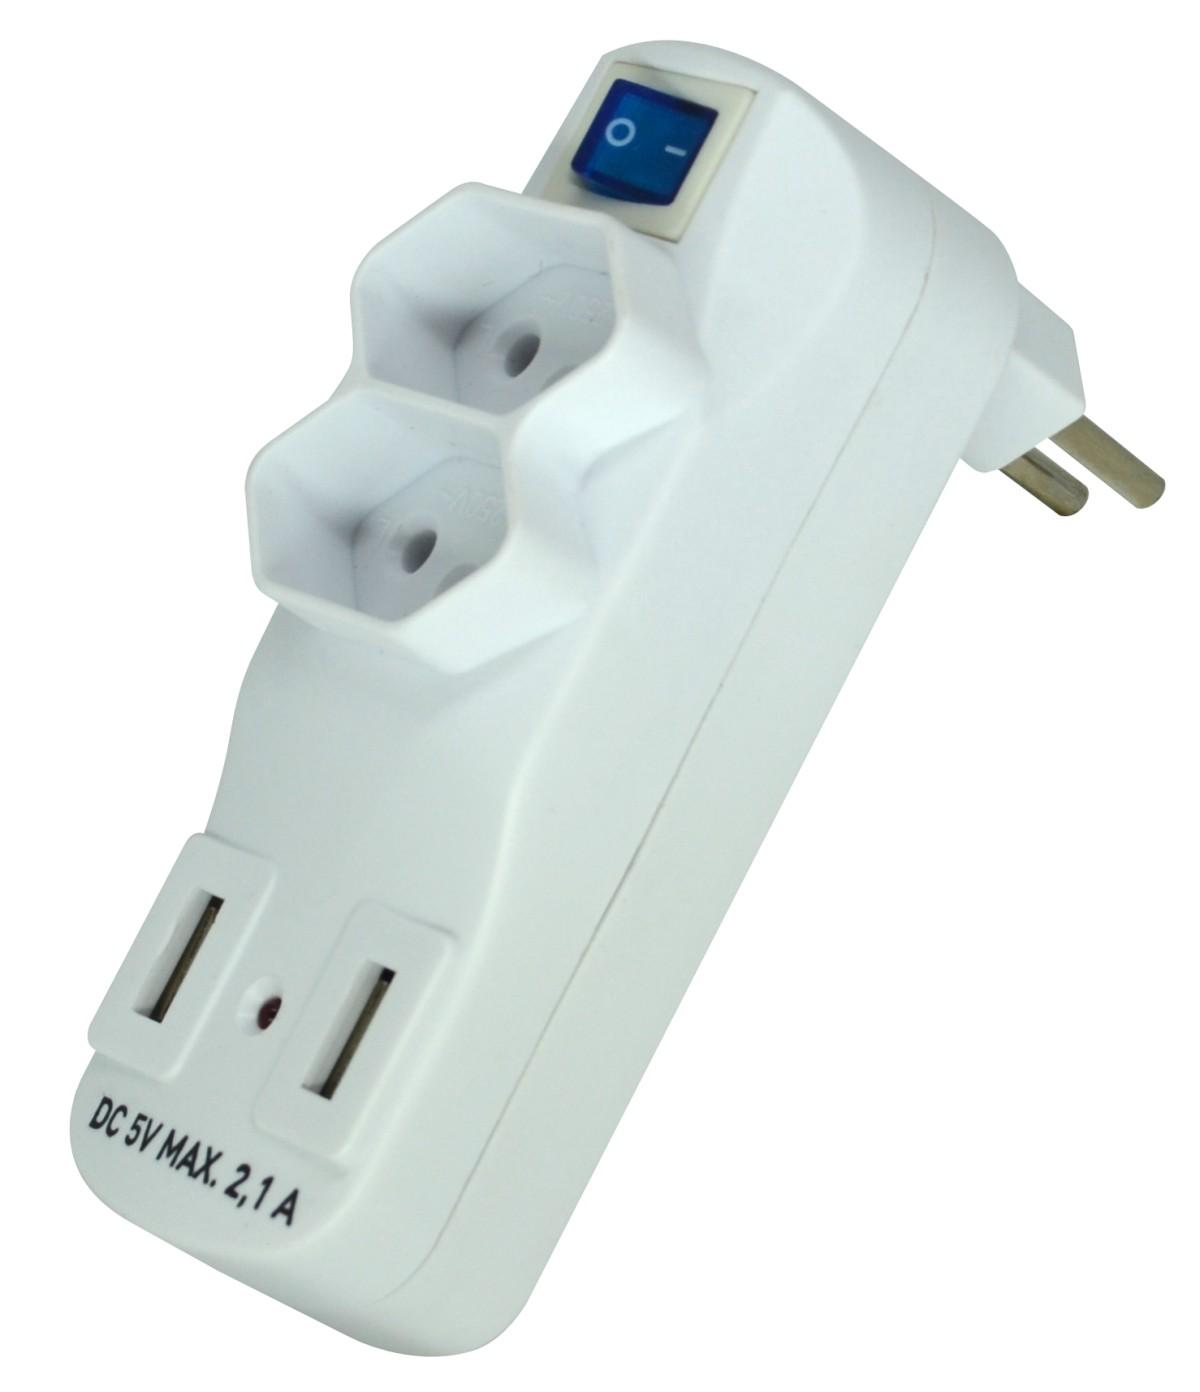 Foto 1 - Adaptador Múltiplo 2 Tomadas + 2 USB